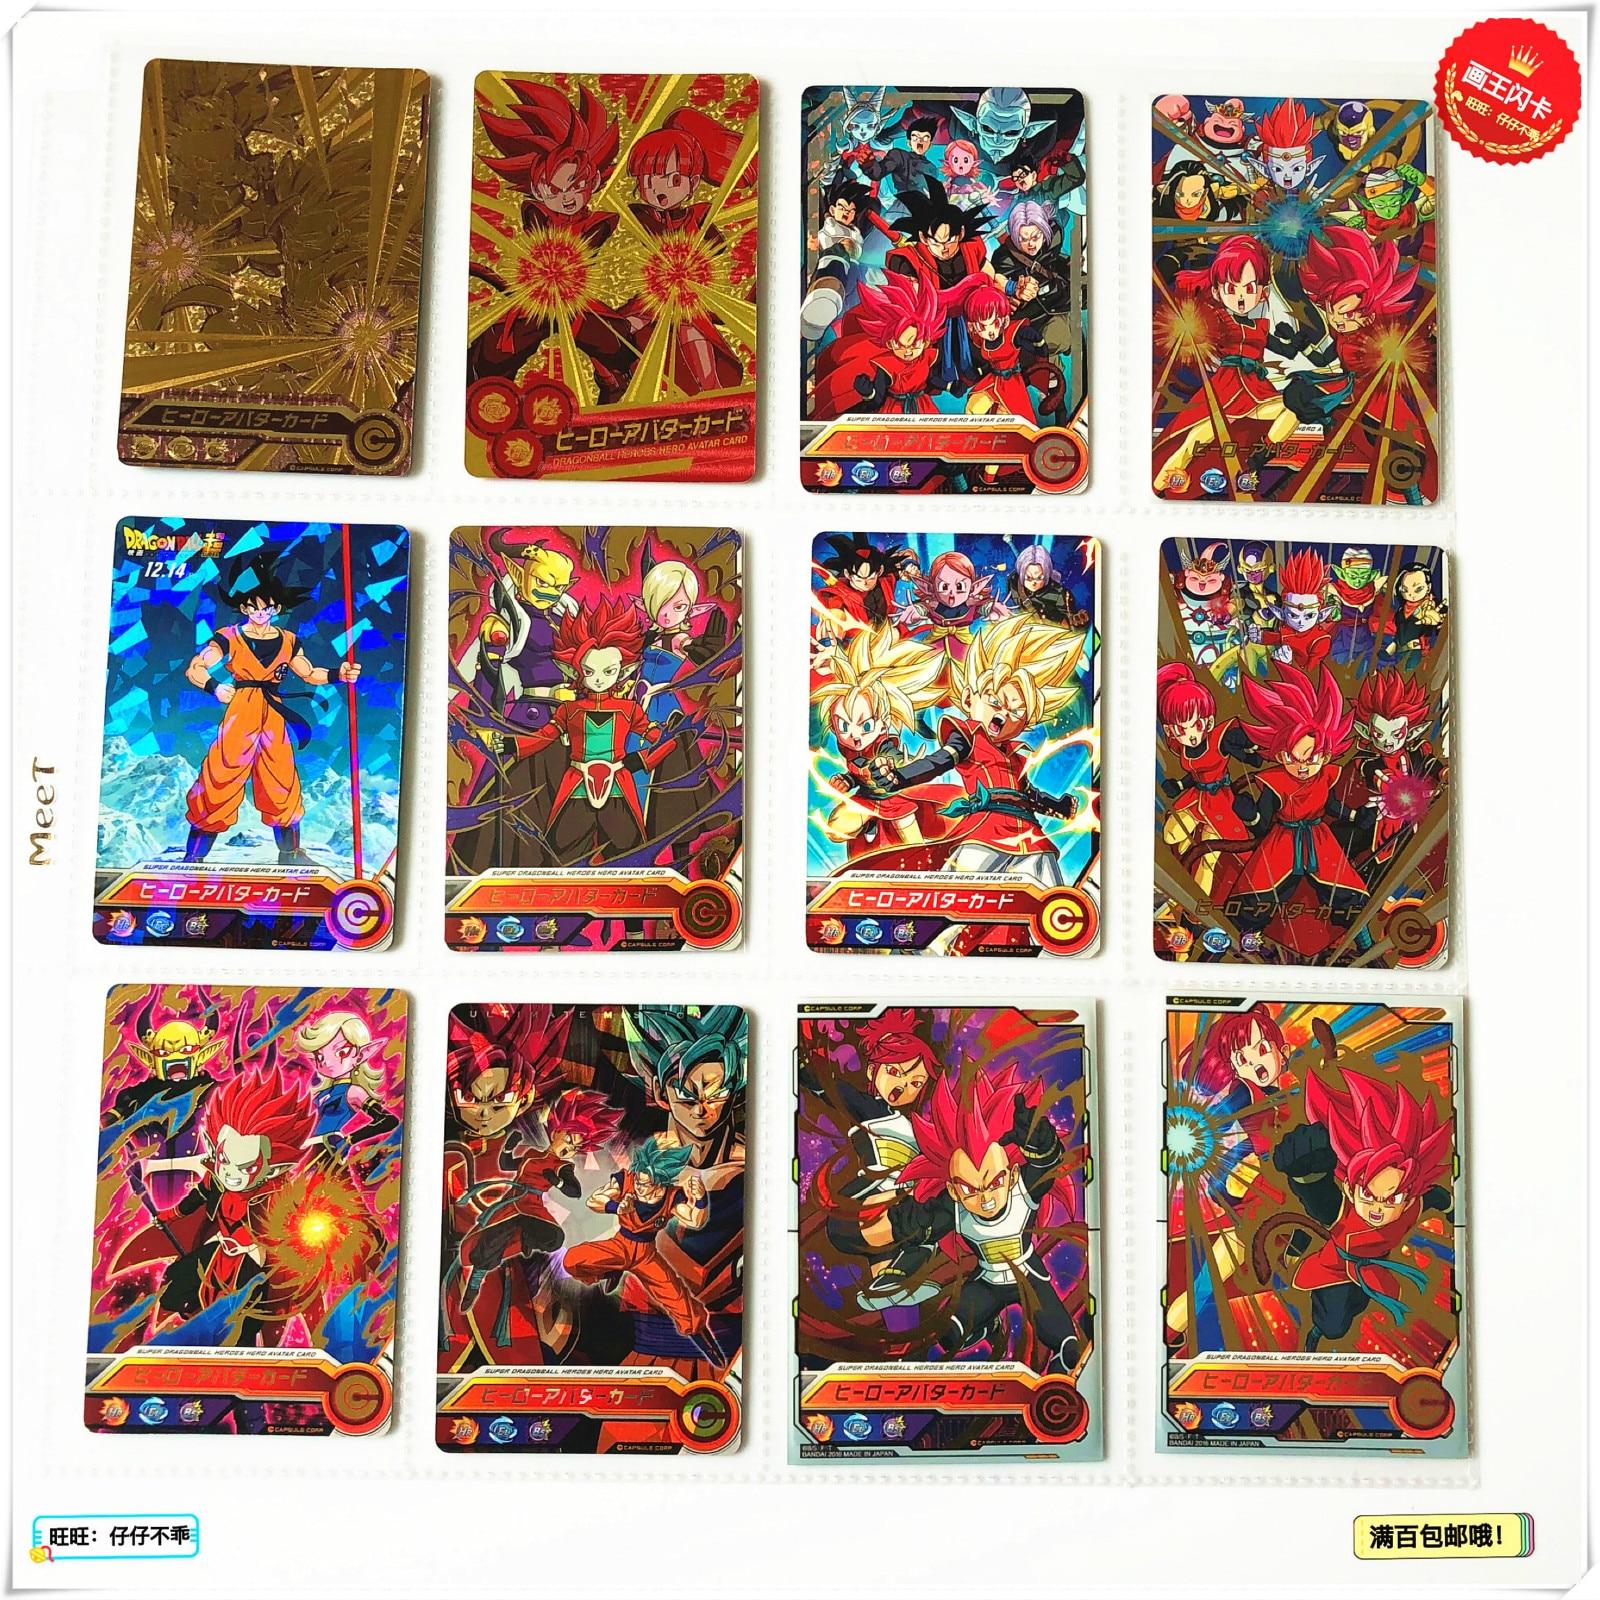 Japan Original Dragon Ball Hero Card Demon God Goku Toys Hobbies Collectibles Game Collection Anime Cards